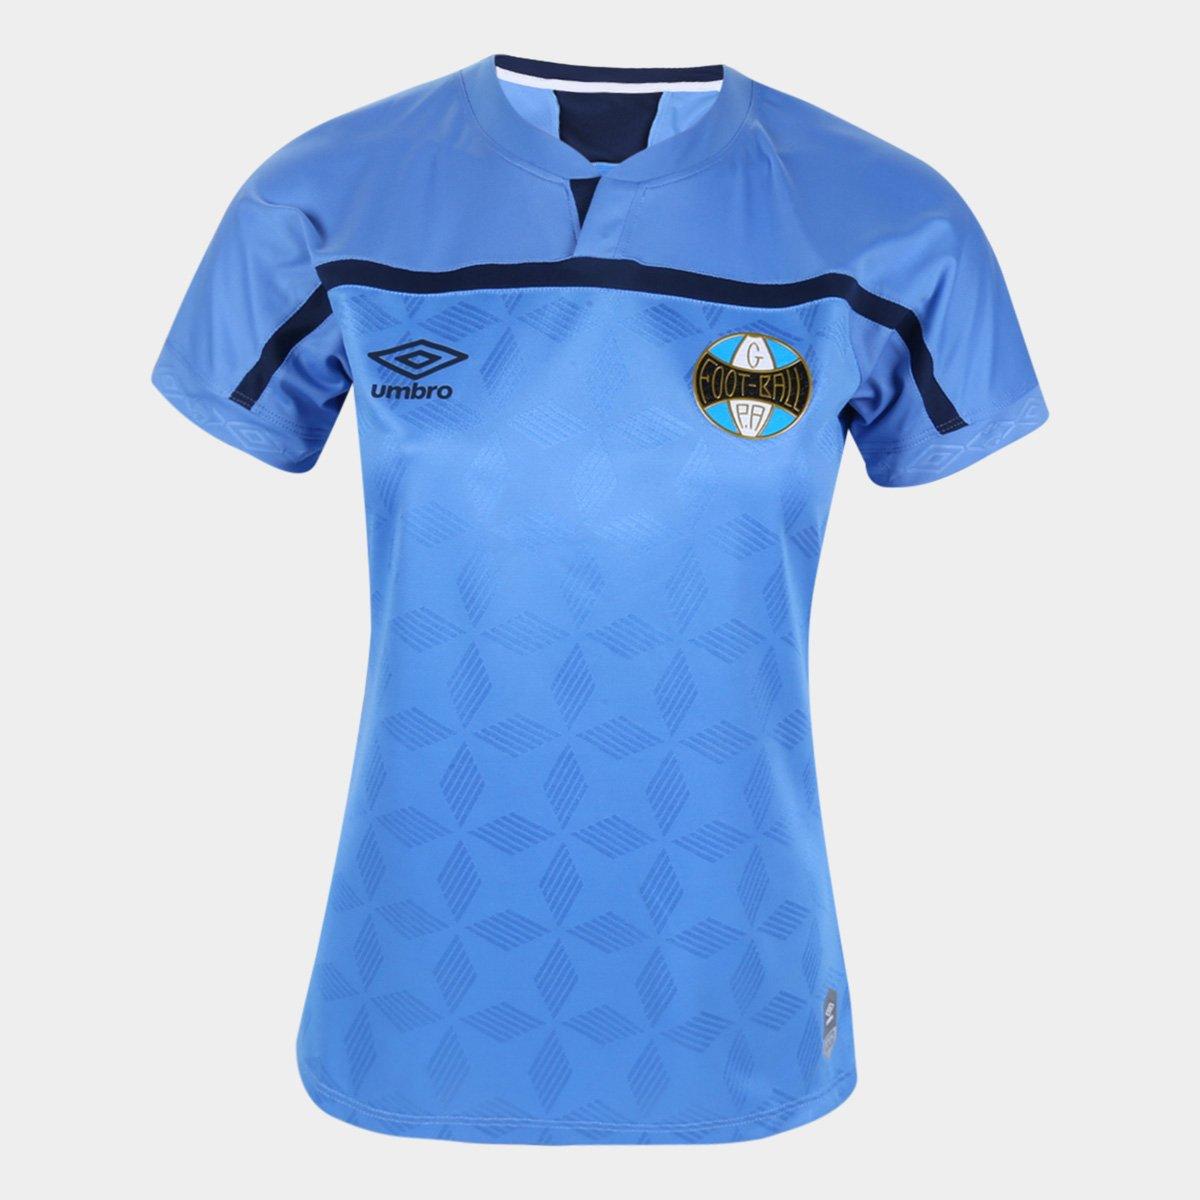 Camisa Grêmio III 20/21 s/n° Torcedor Umbro Feminina